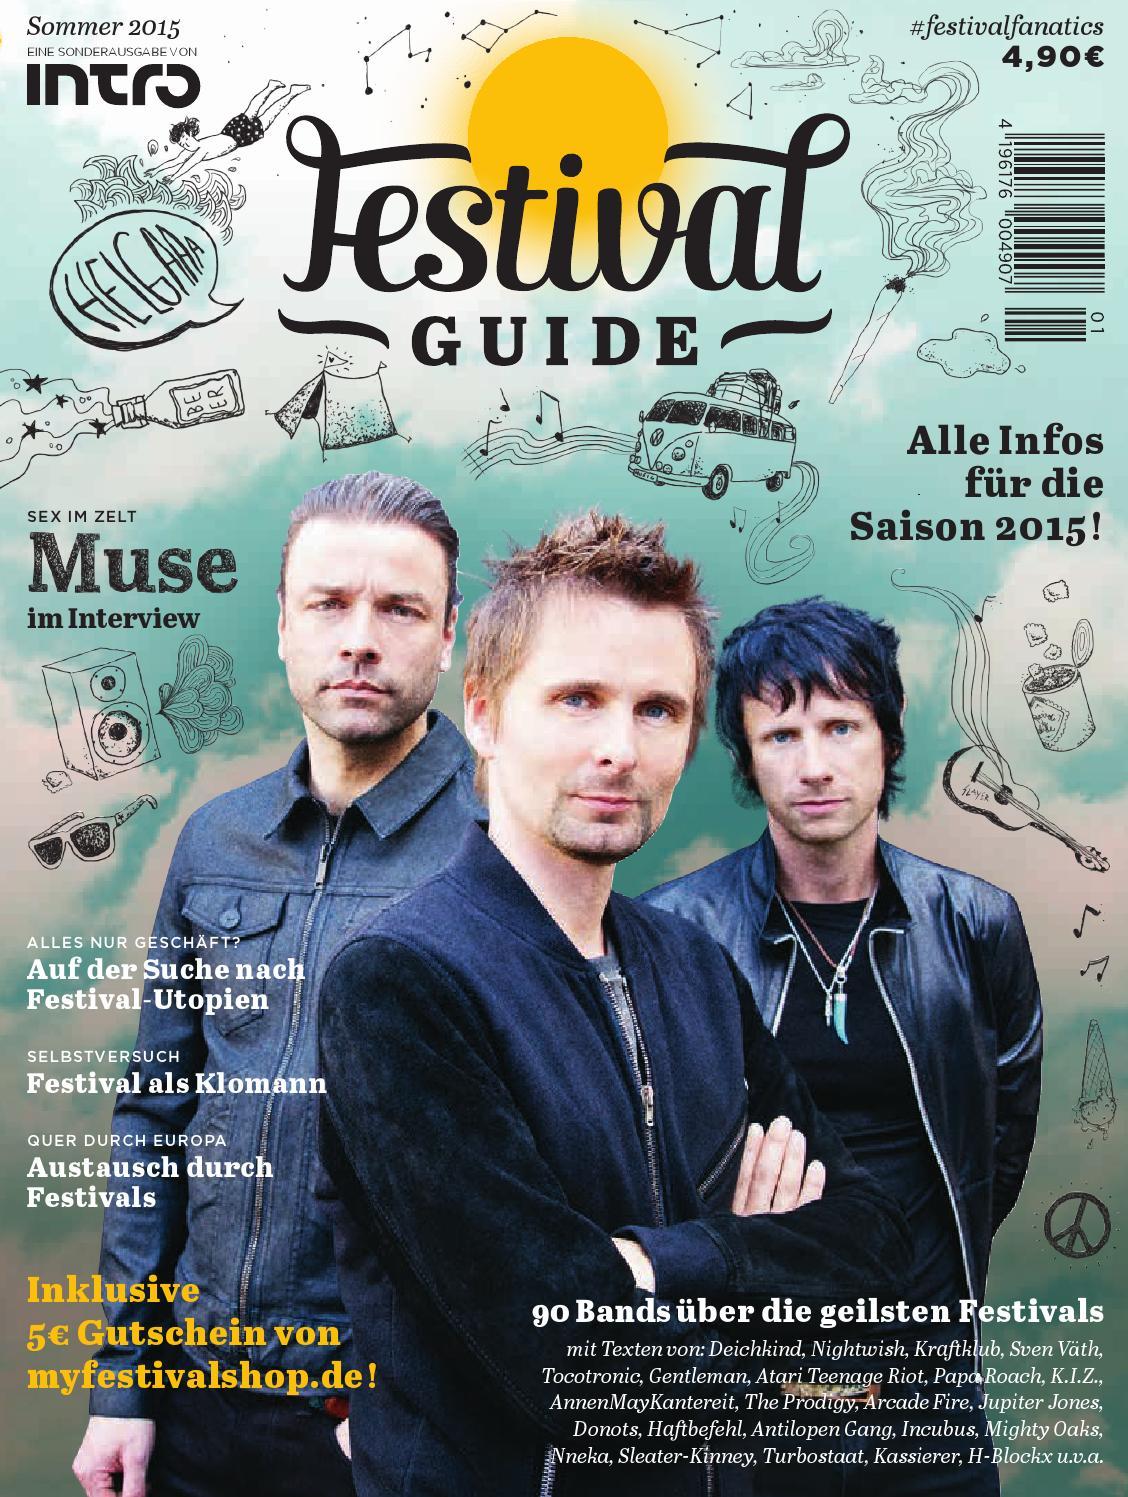 brand new 4a517 2f651 Festivalguide 2015 by Intro GmbH und Co. KG - issuu